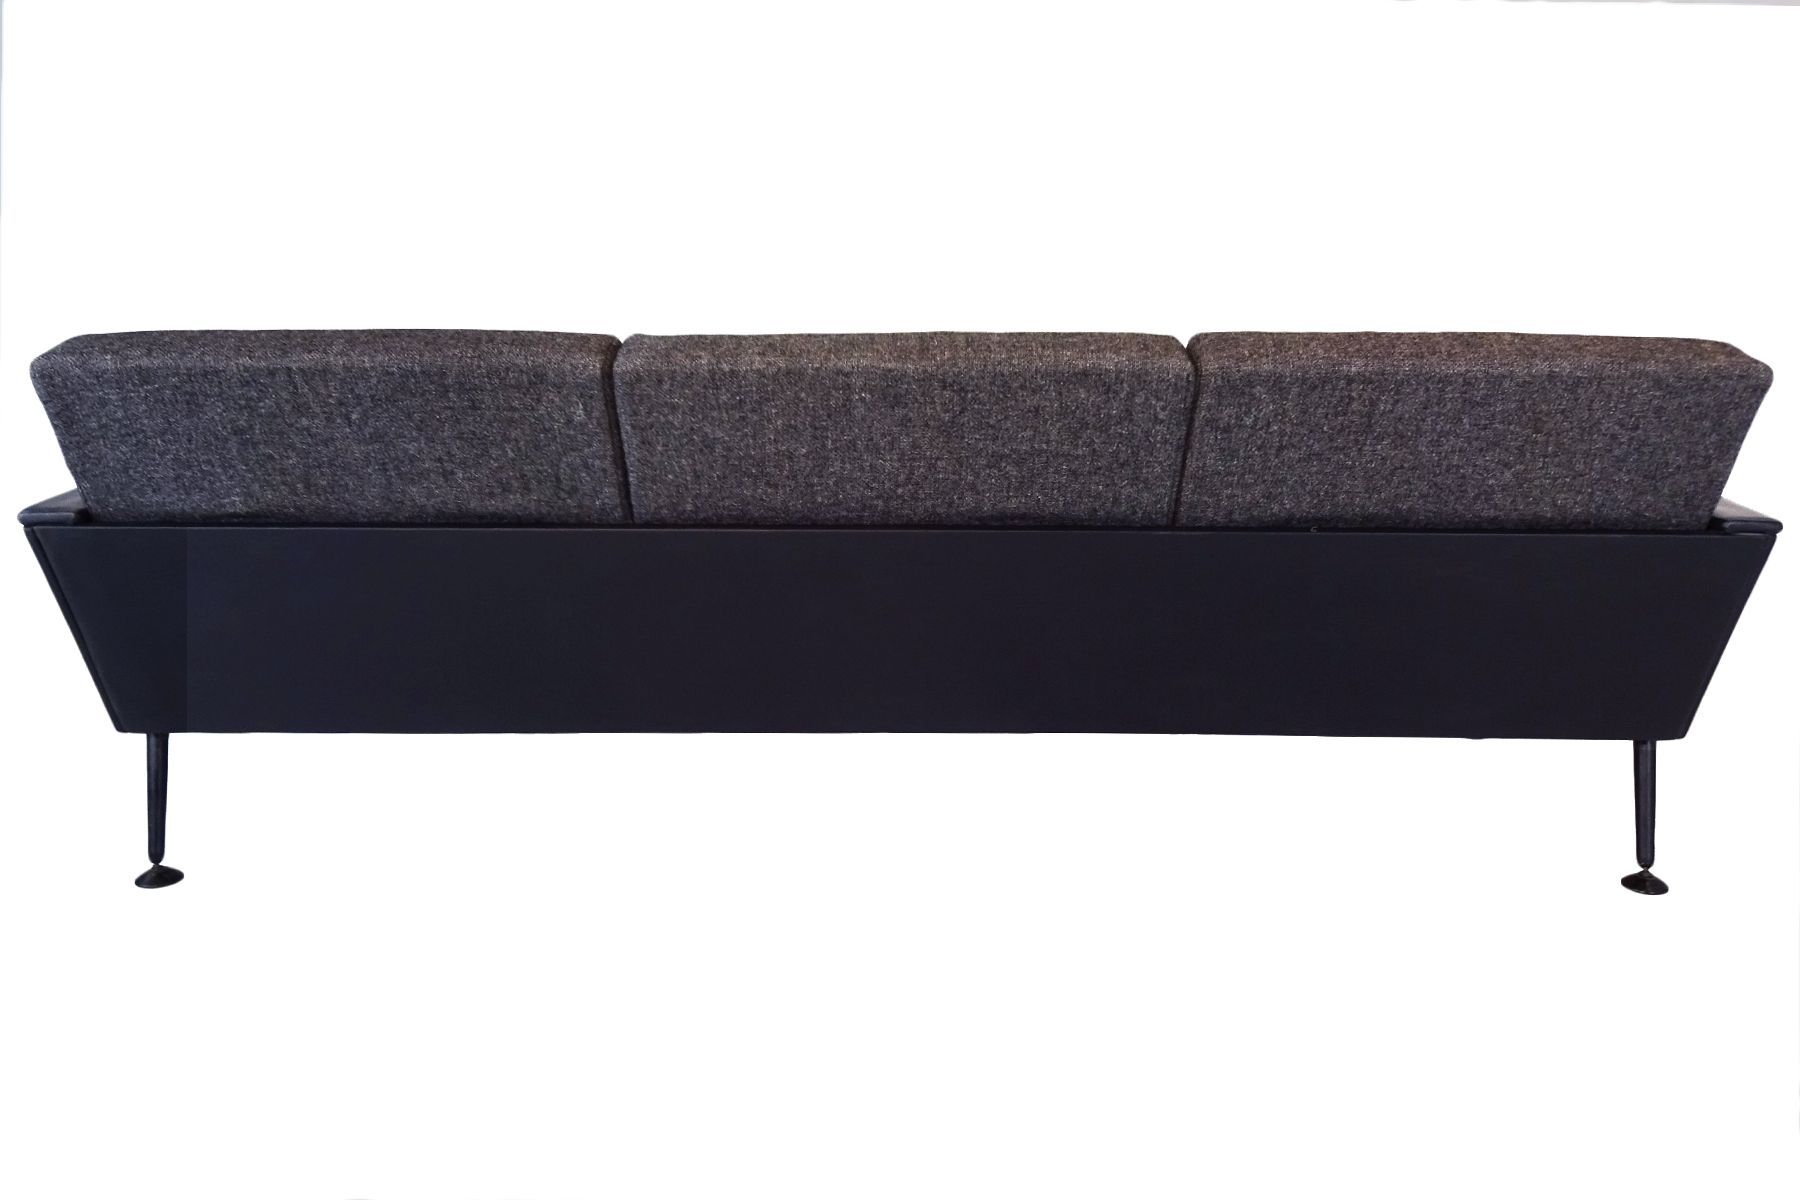 R57 3 sitzer sofa aus stoff leder von ernest race for Sofa 4 sitzer stoff